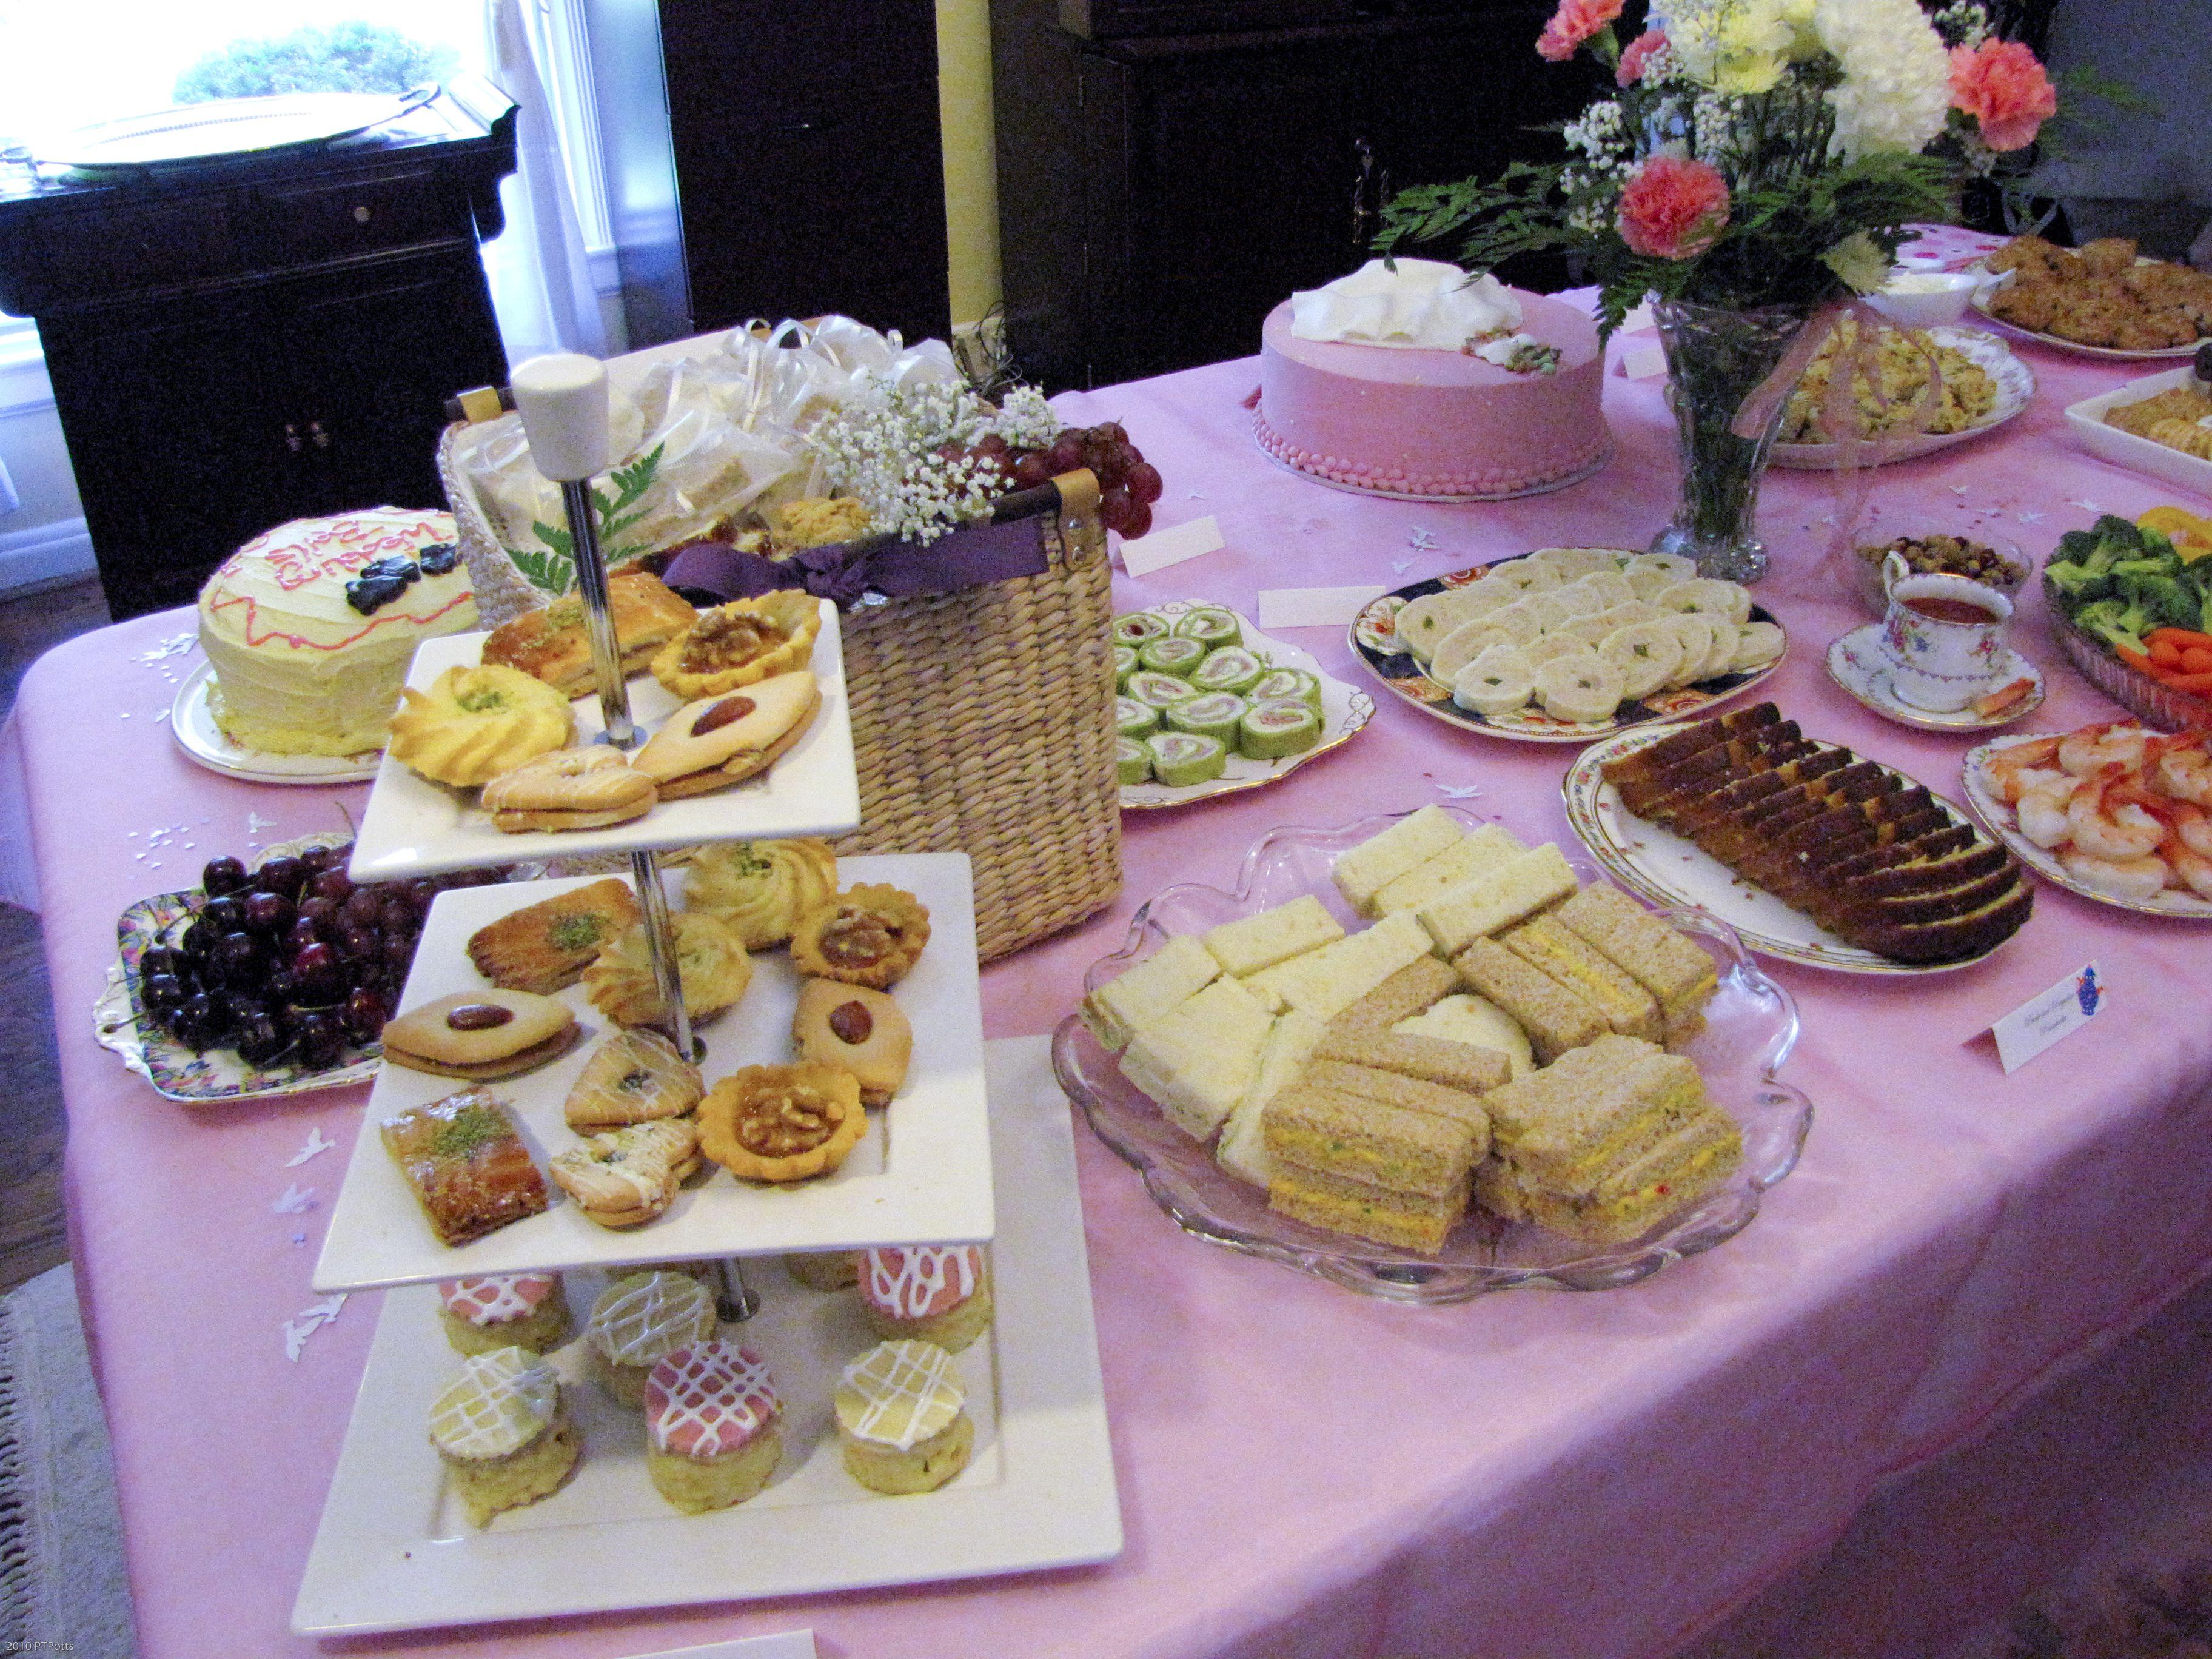 bridal tea food ideas jane austen tea party bridal shower i see hungry people